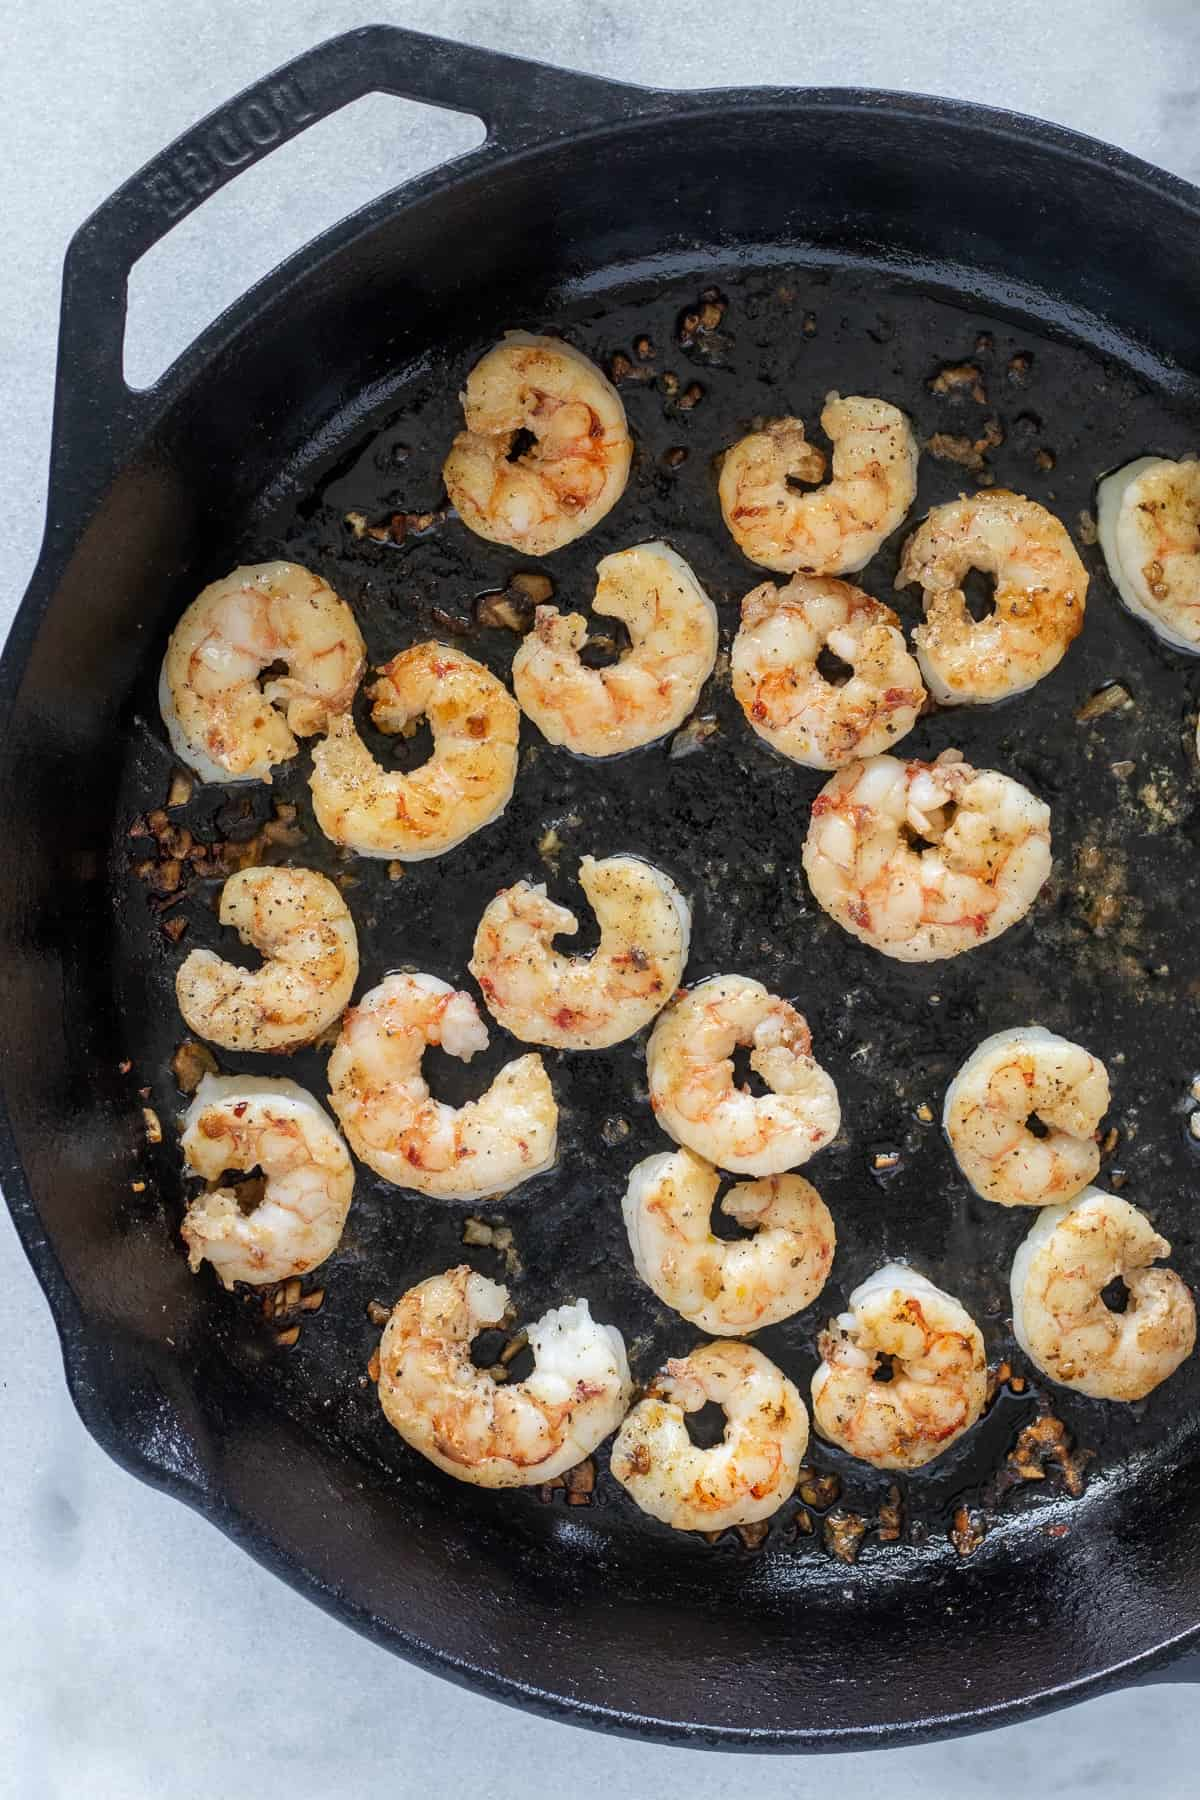 Sauté the shrimp for 2 minutes on the second side